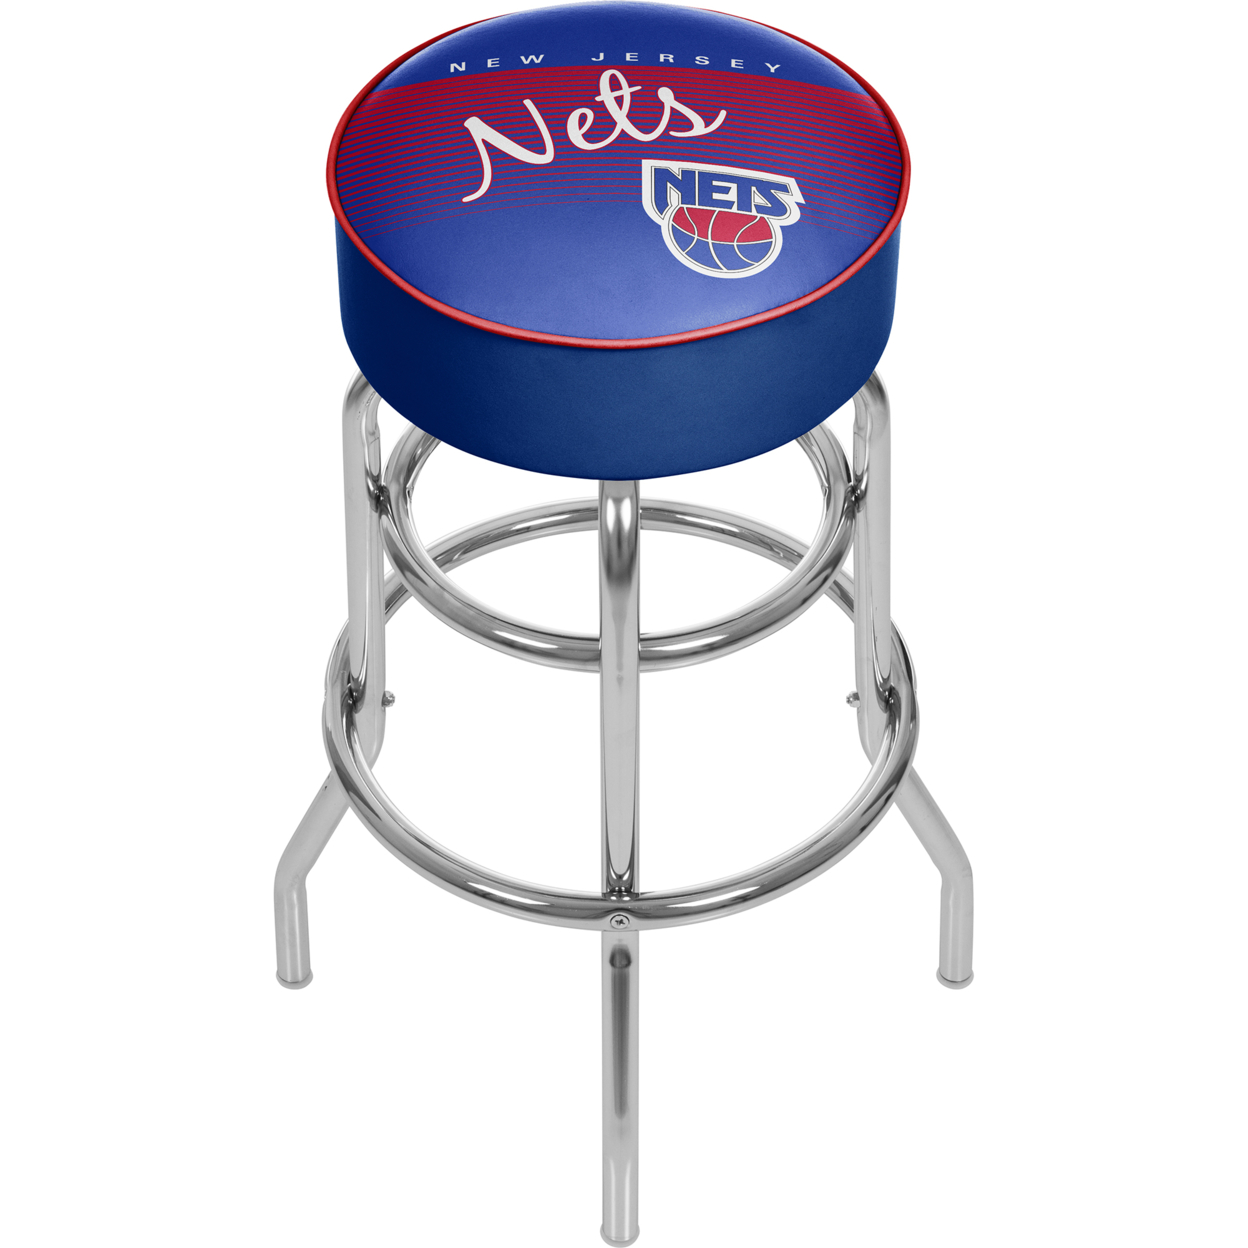 New Jersey Nets NBA Hardwood Classics Padded Swivel Bar Stool 30 Inches High brooklyn nets nba property of hoodie purse